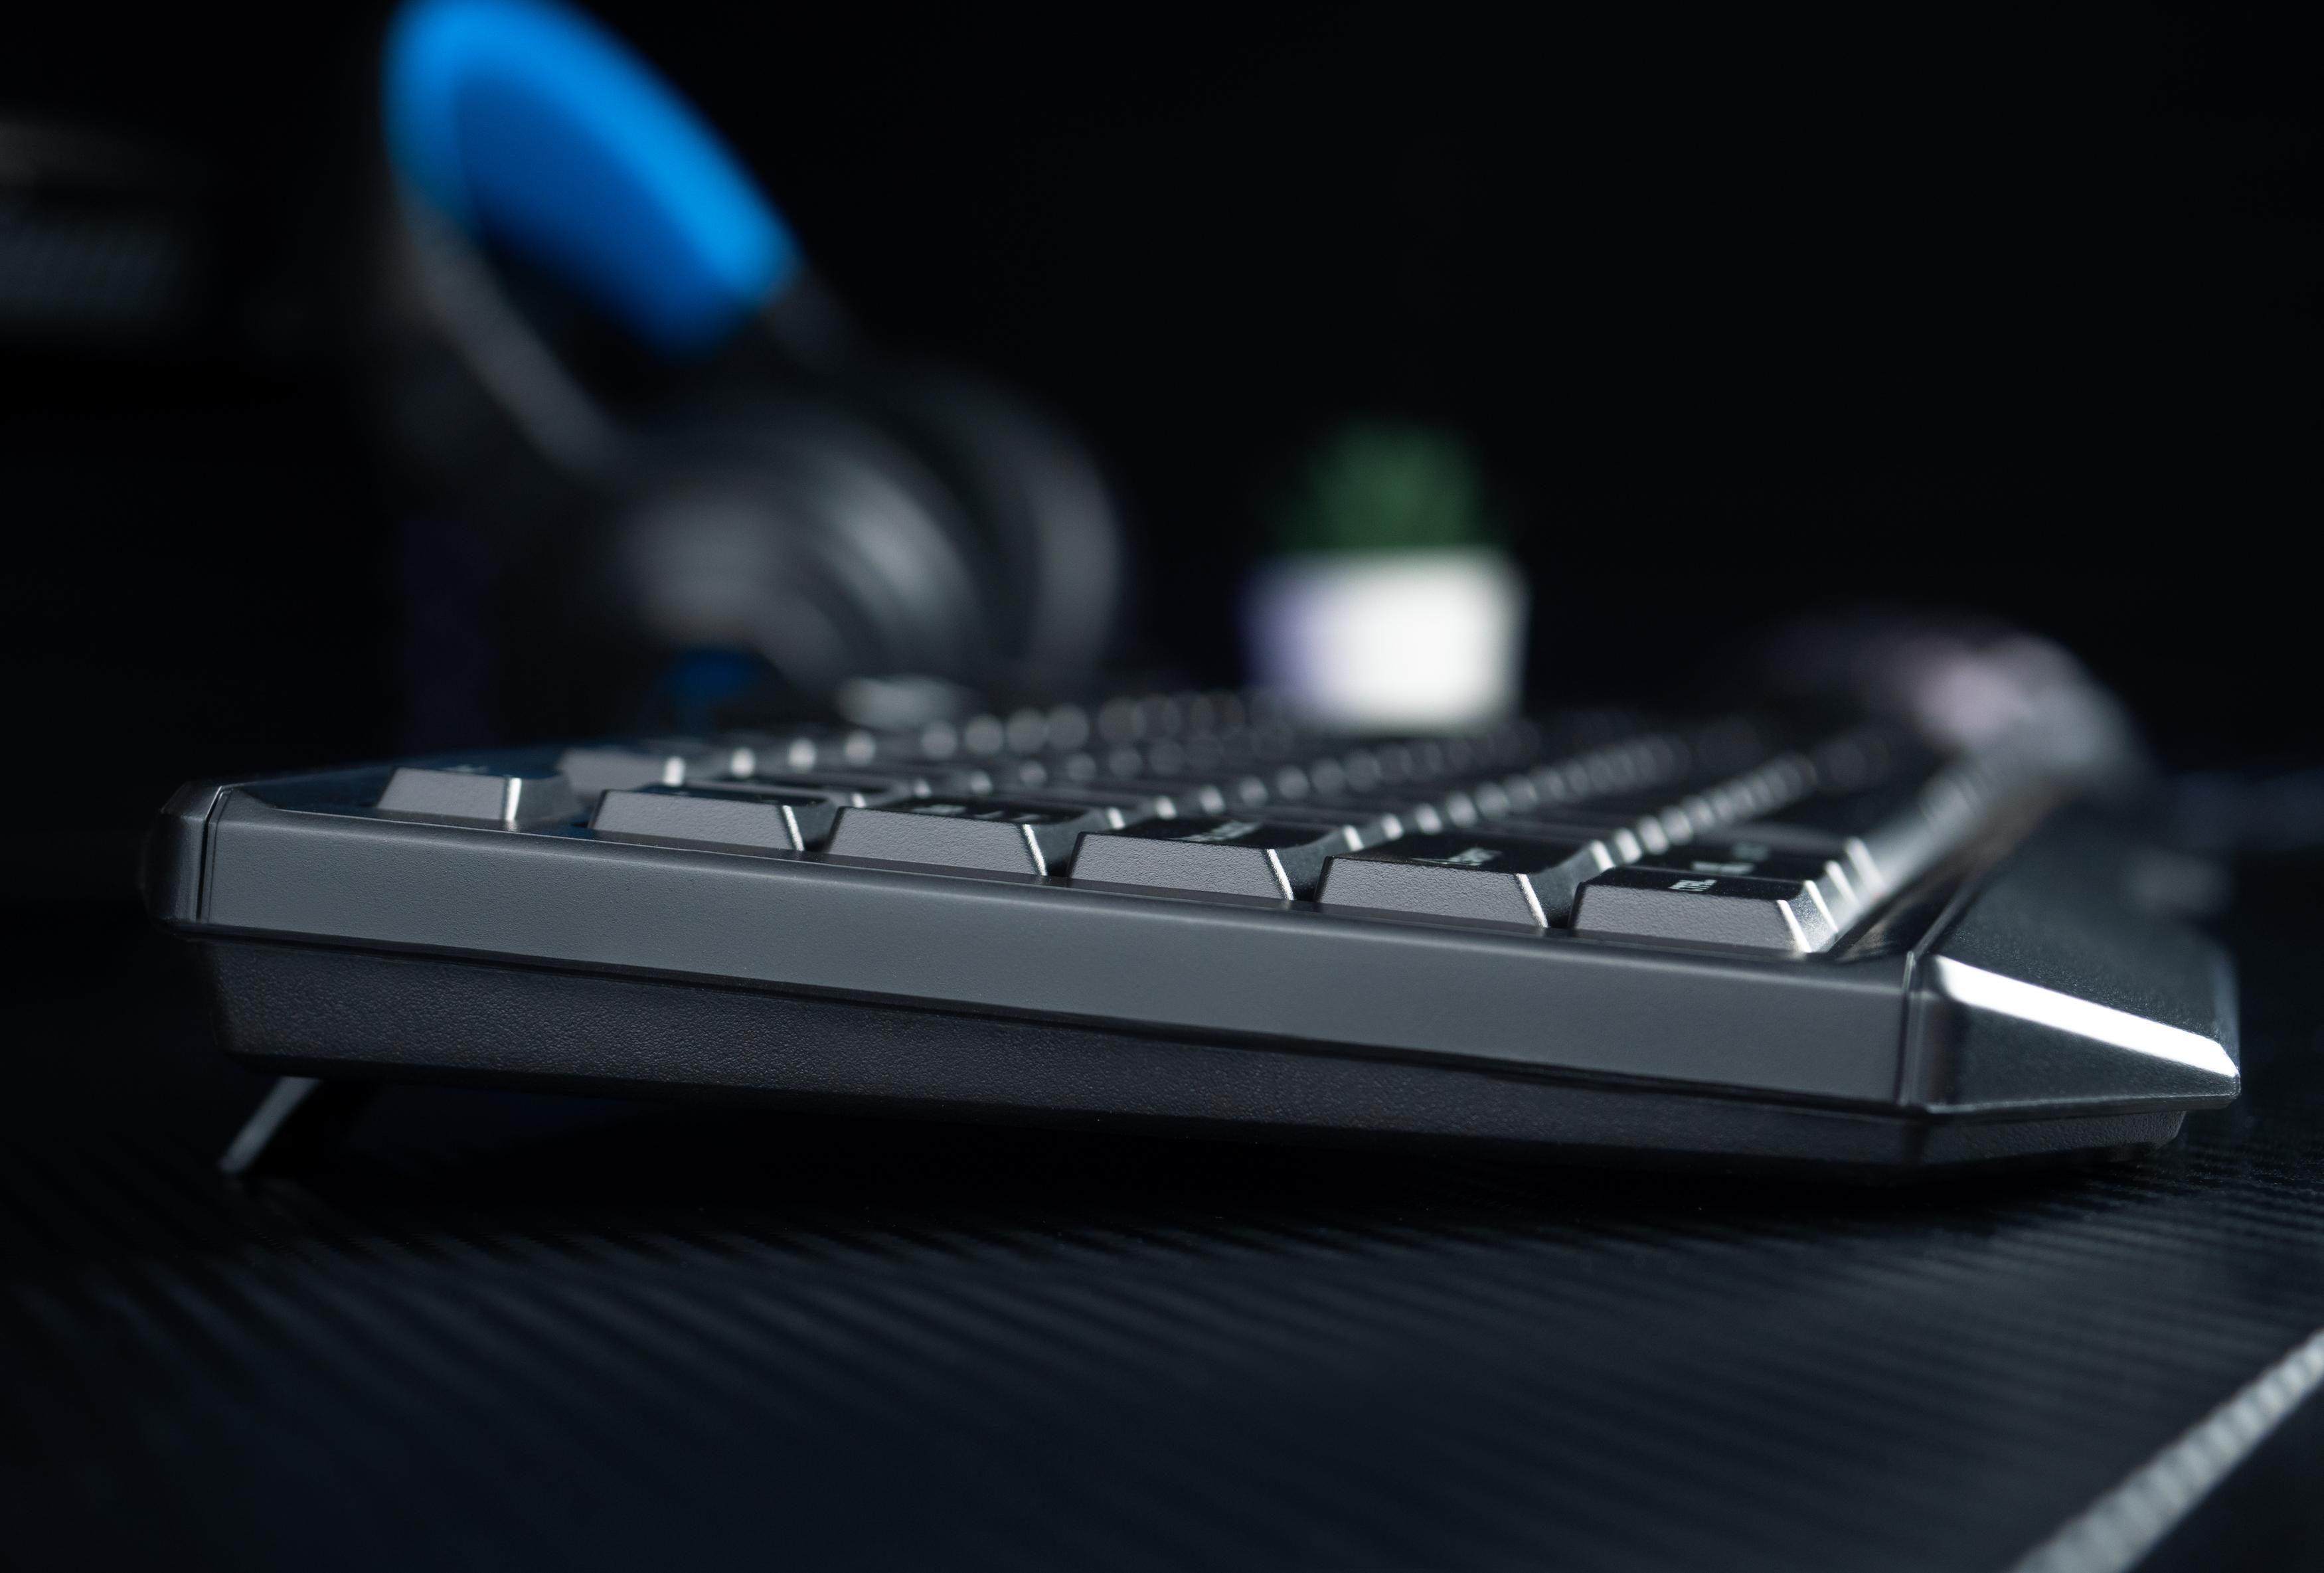 gaming combo set 4in1 fury thunderstreak 3.0 cz/sk keyboard + mouse + headphones + mousepad, cz/sk 3